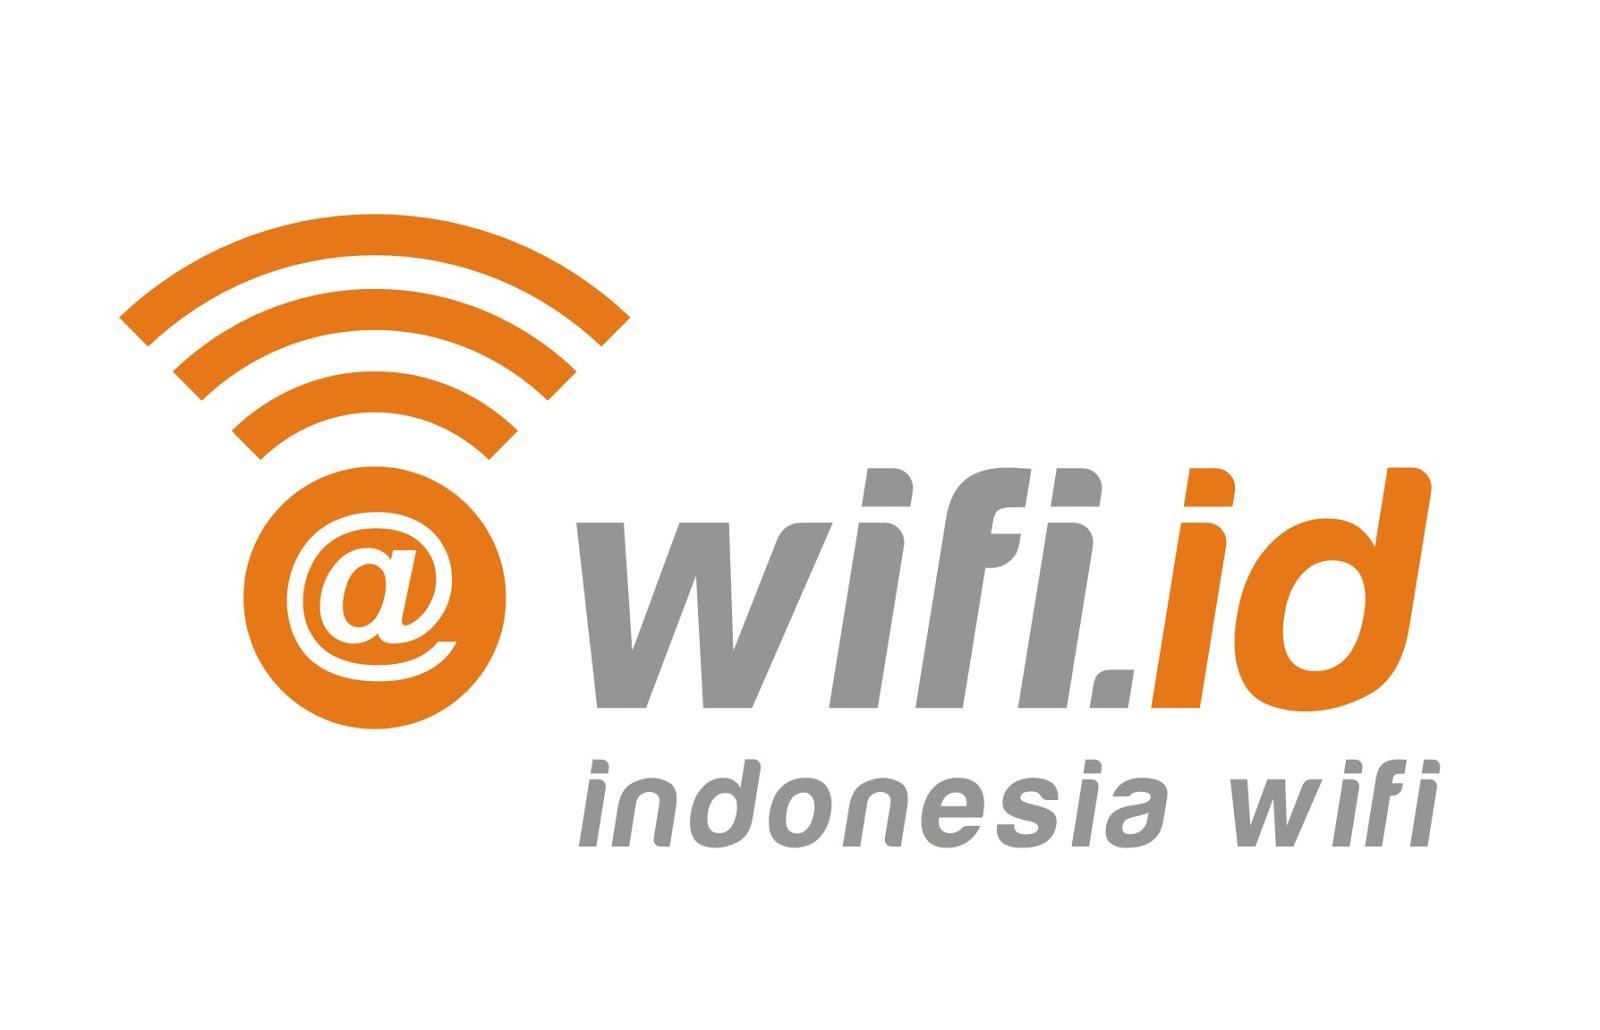 WIFI ID